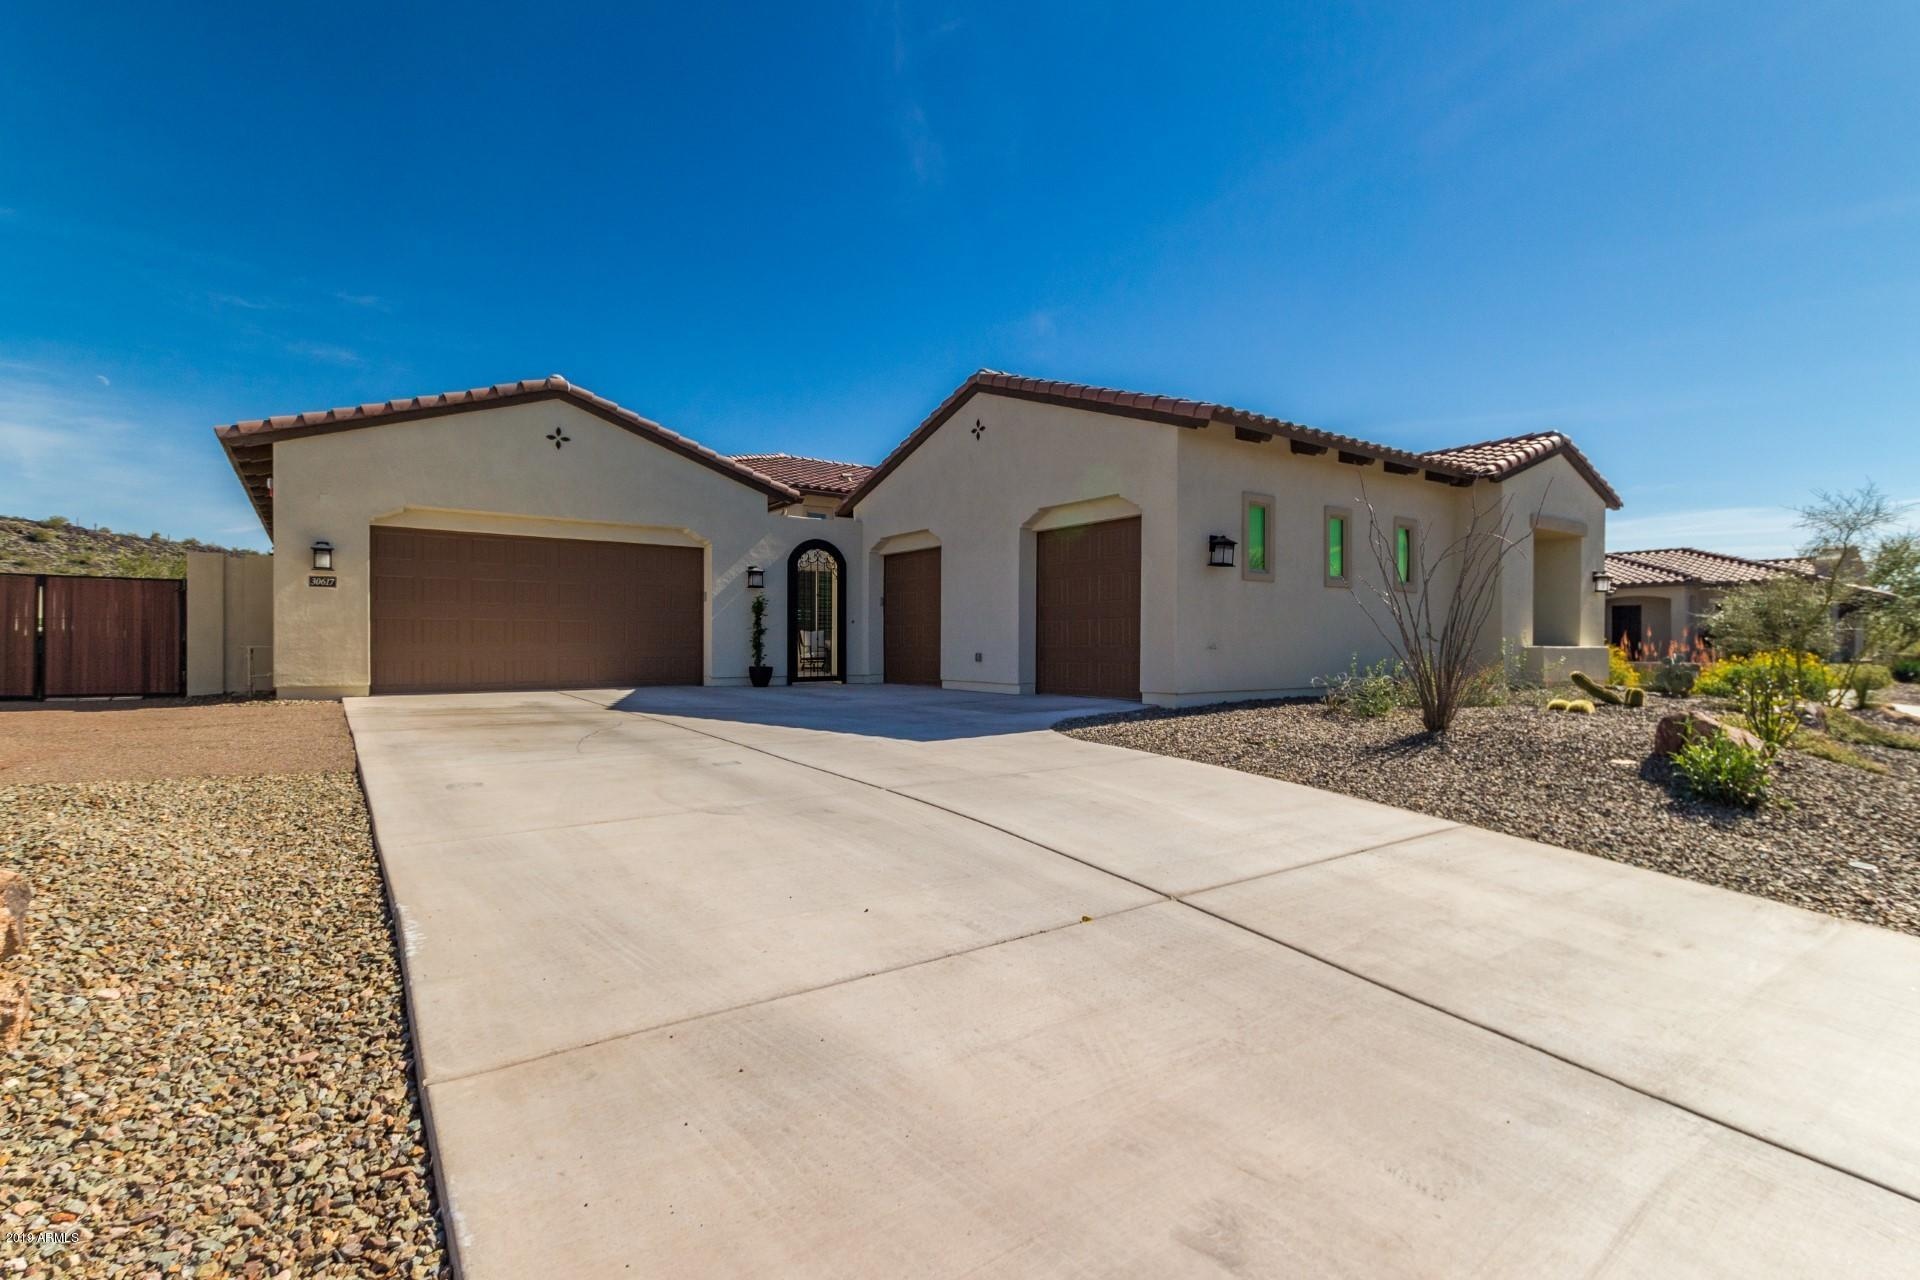 Photo of 30617 N 117TH Drive, Peoria, AZ 85383